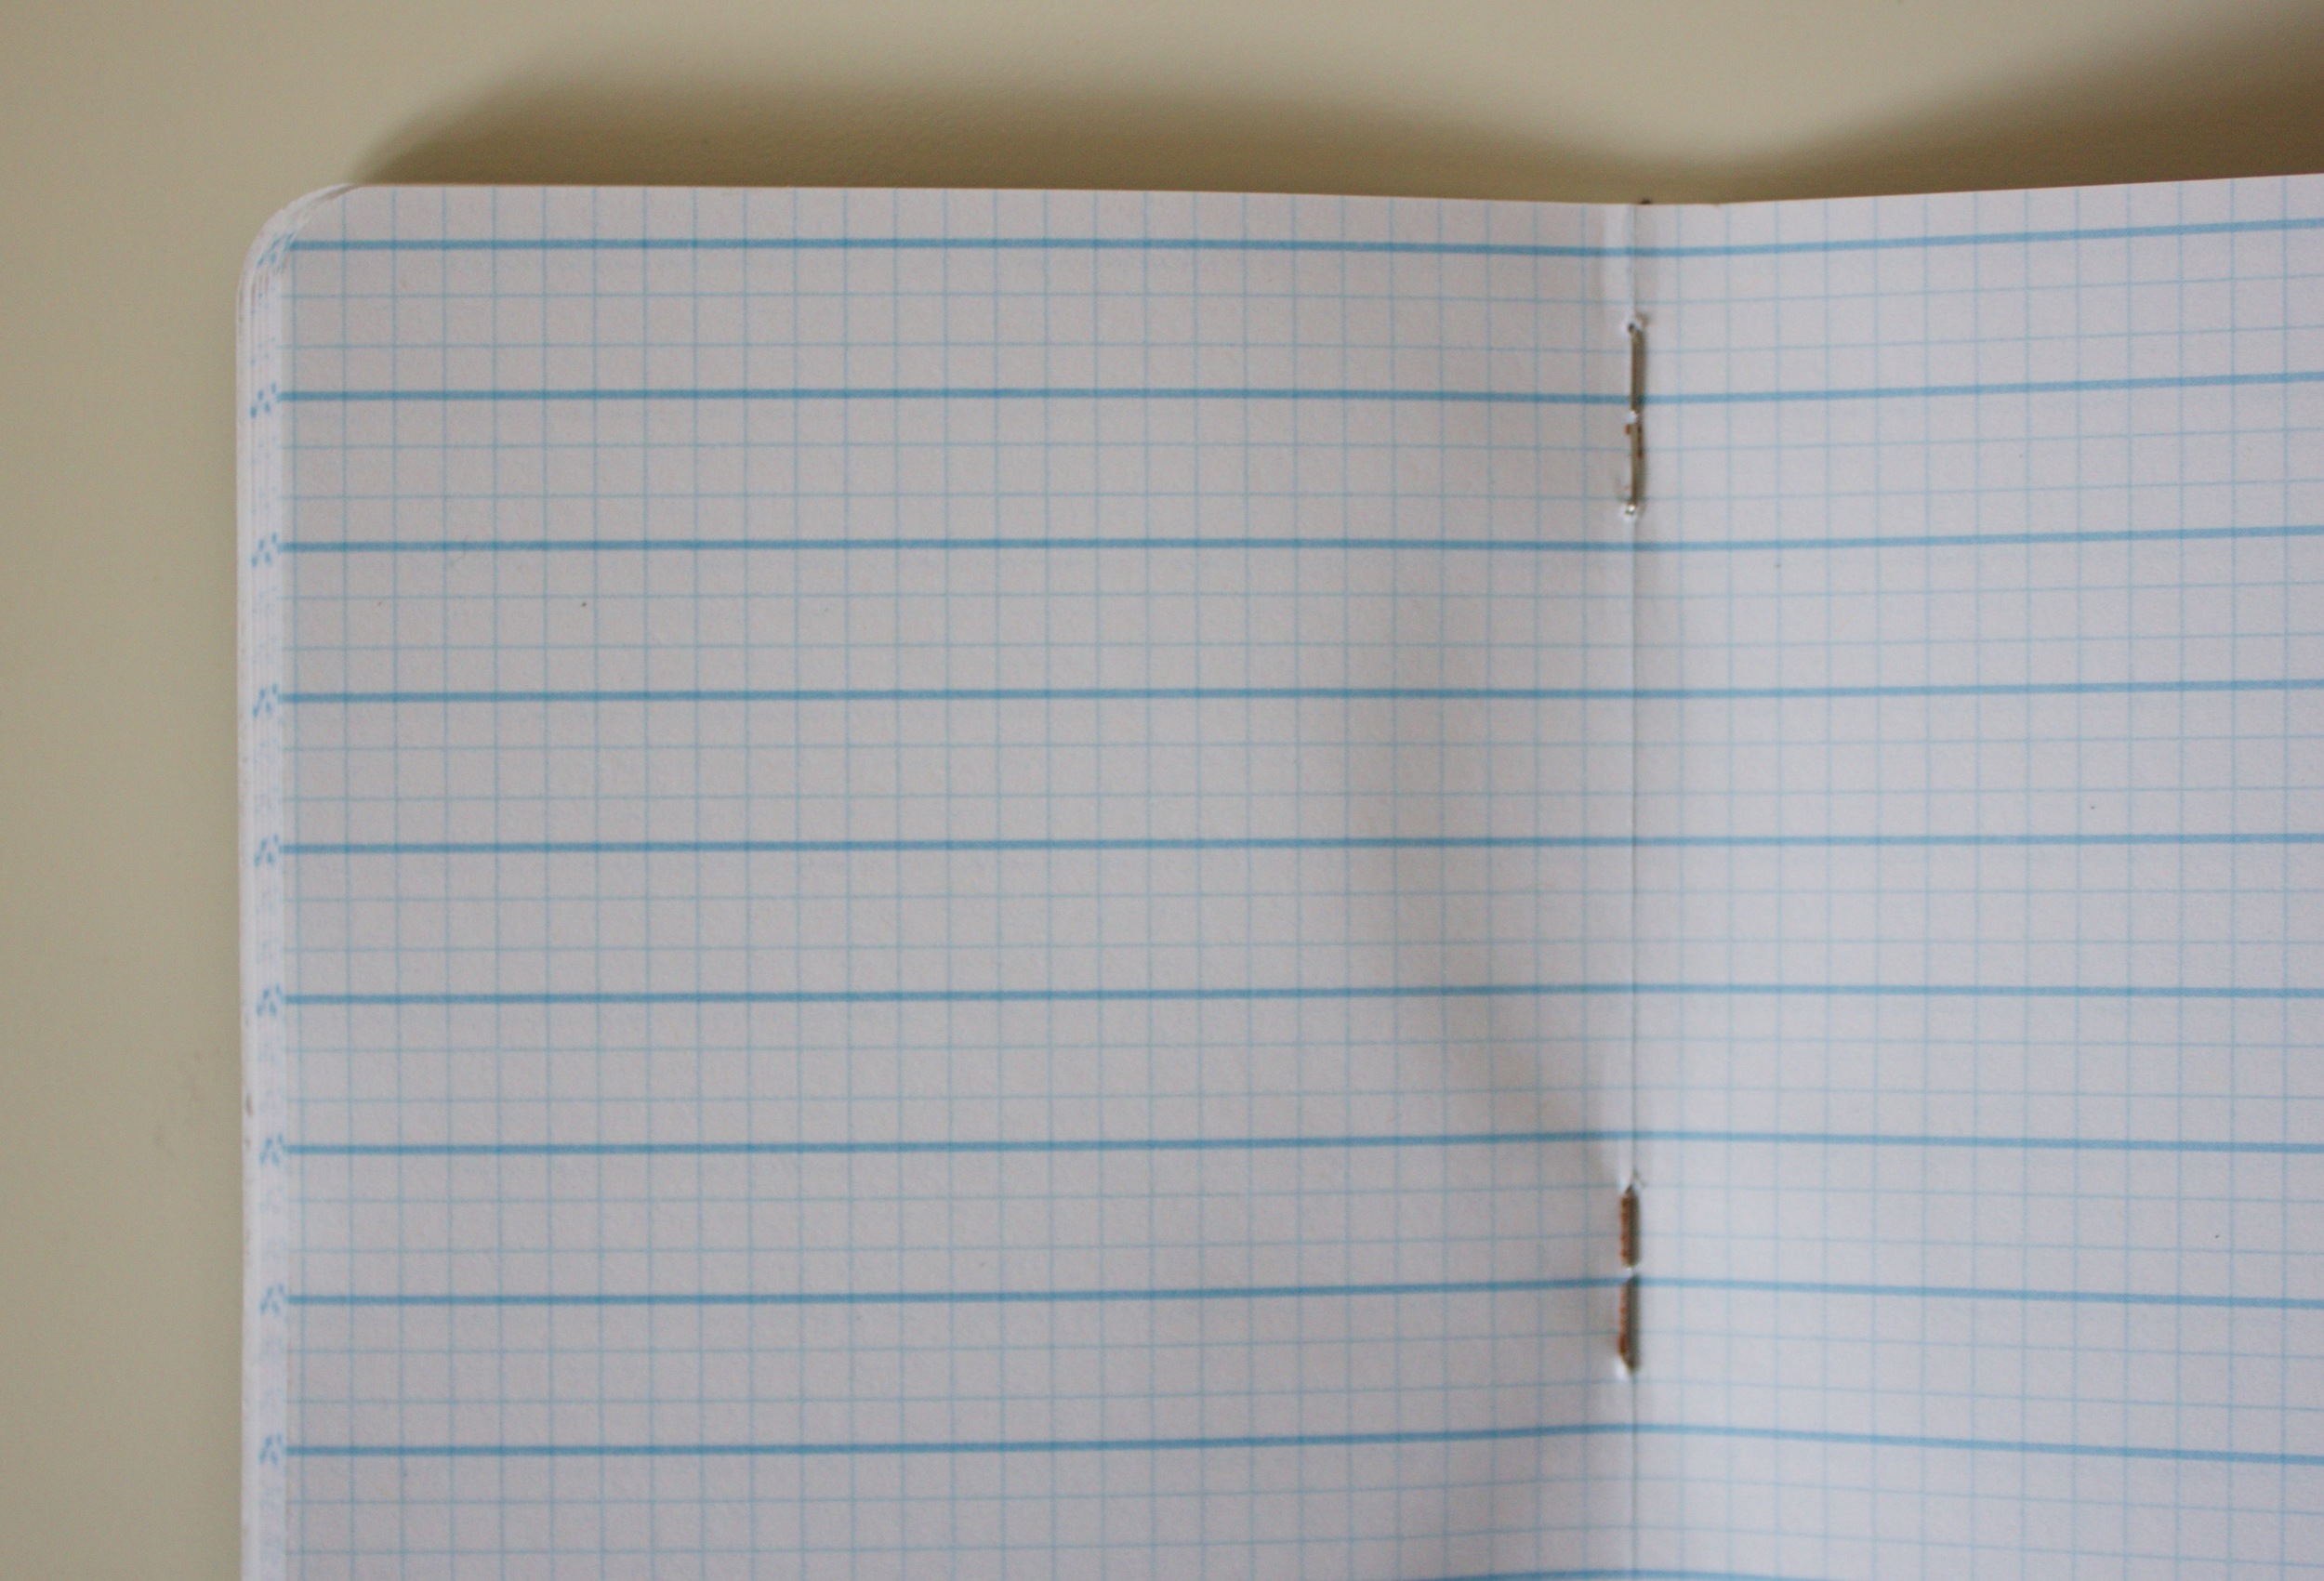 Doane Paper grid